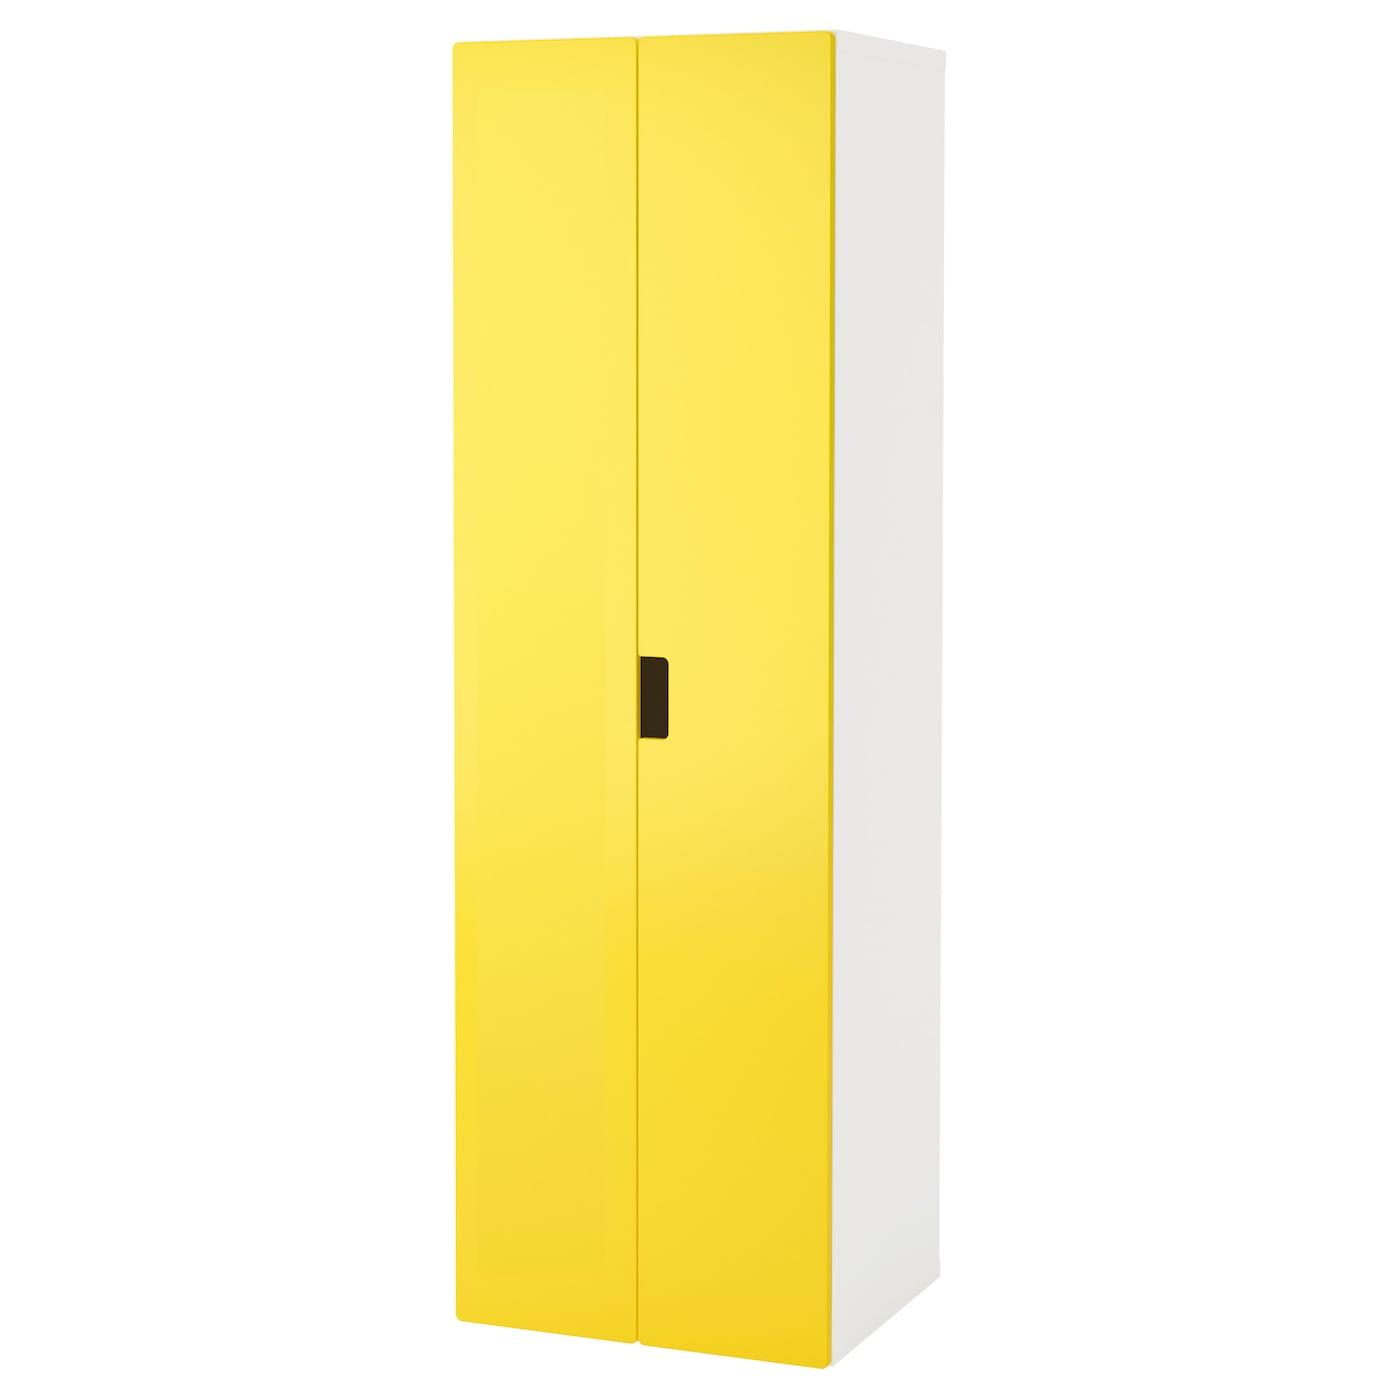 STUVA Wardrobe White yellow 60x50x192 cm IKEA